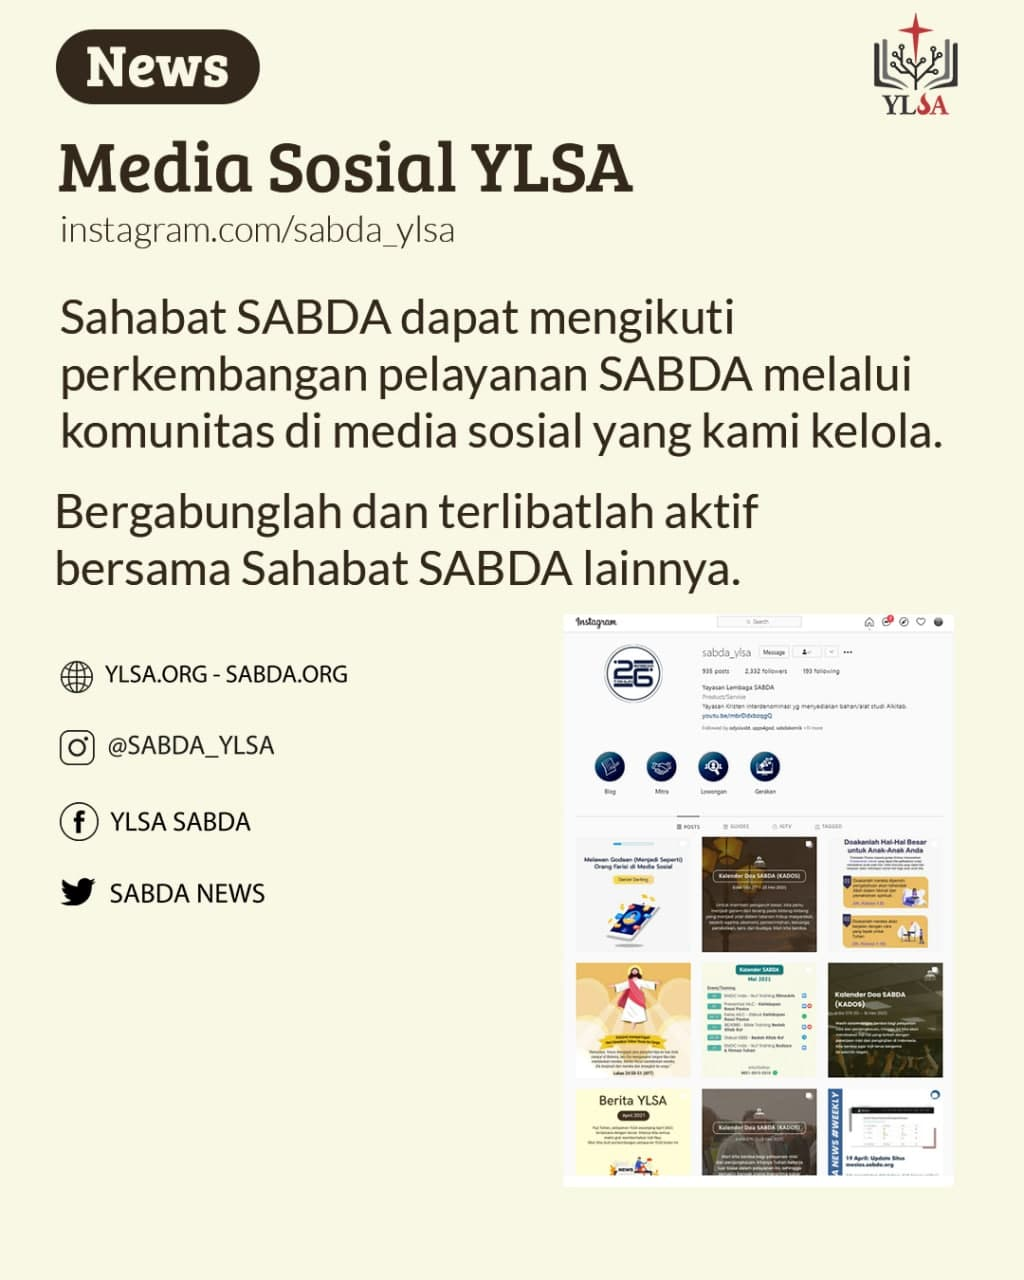 Sahabat SABDA dapat mengikuti perkembangan pelayanan SABDA melalui komunitas di media sosial.